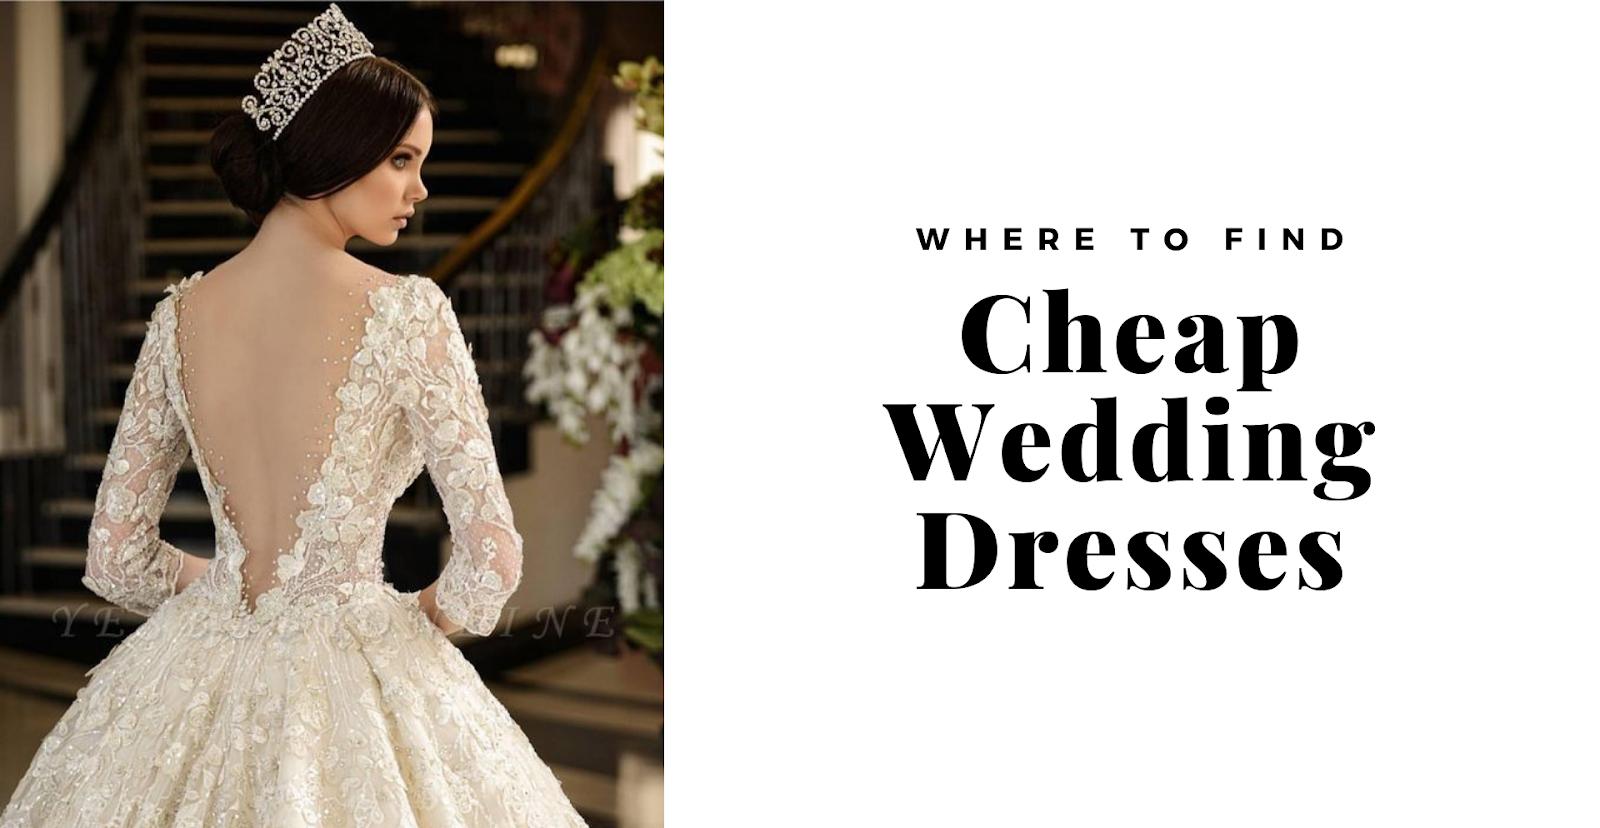 girl wearing a wedding dress